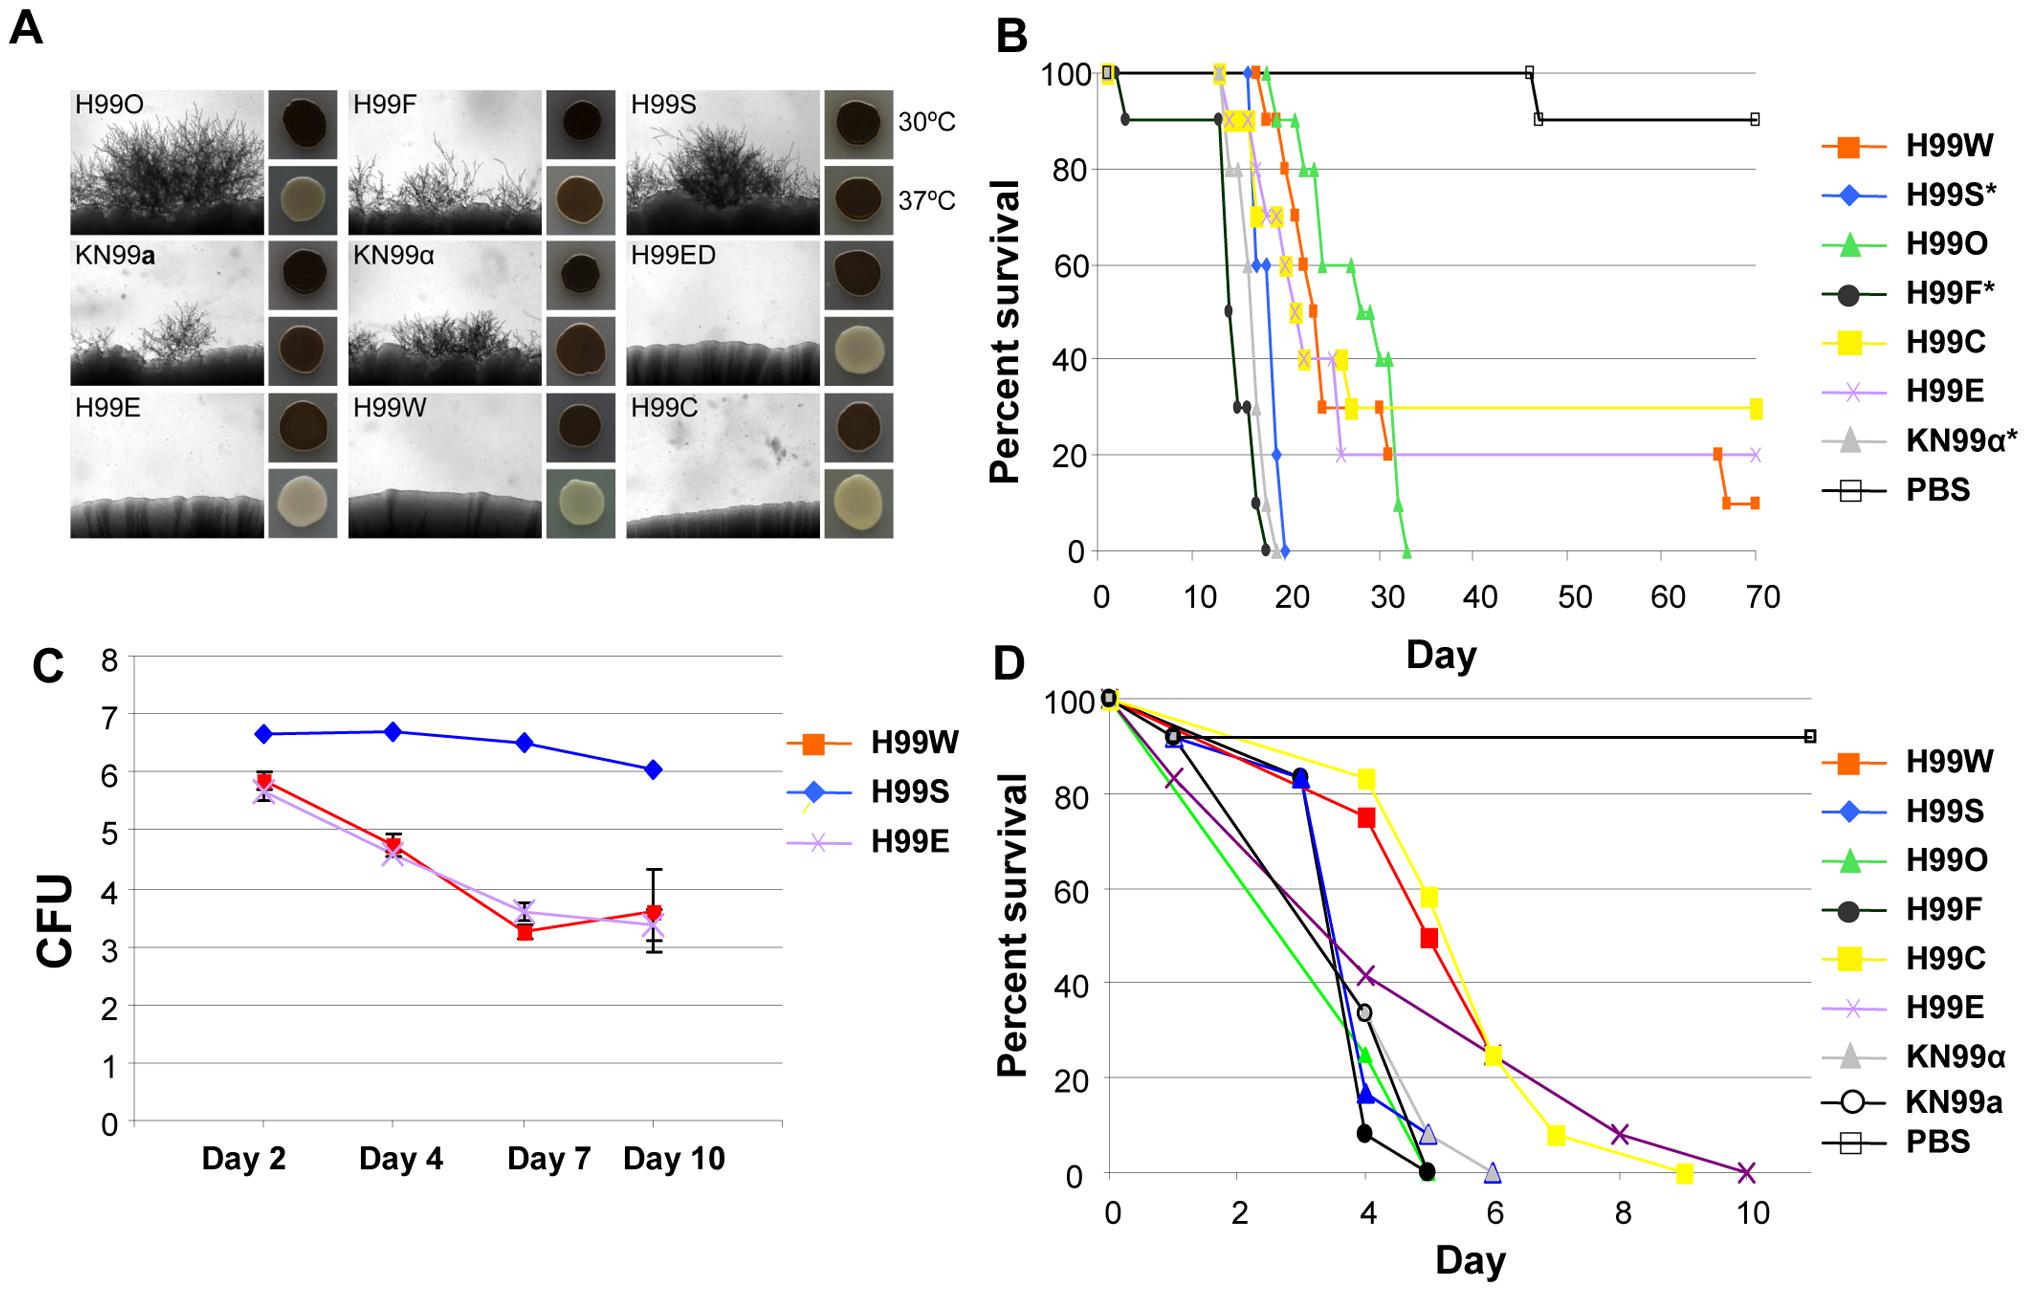 H99 passaged strains exhibit phenotypic variability.